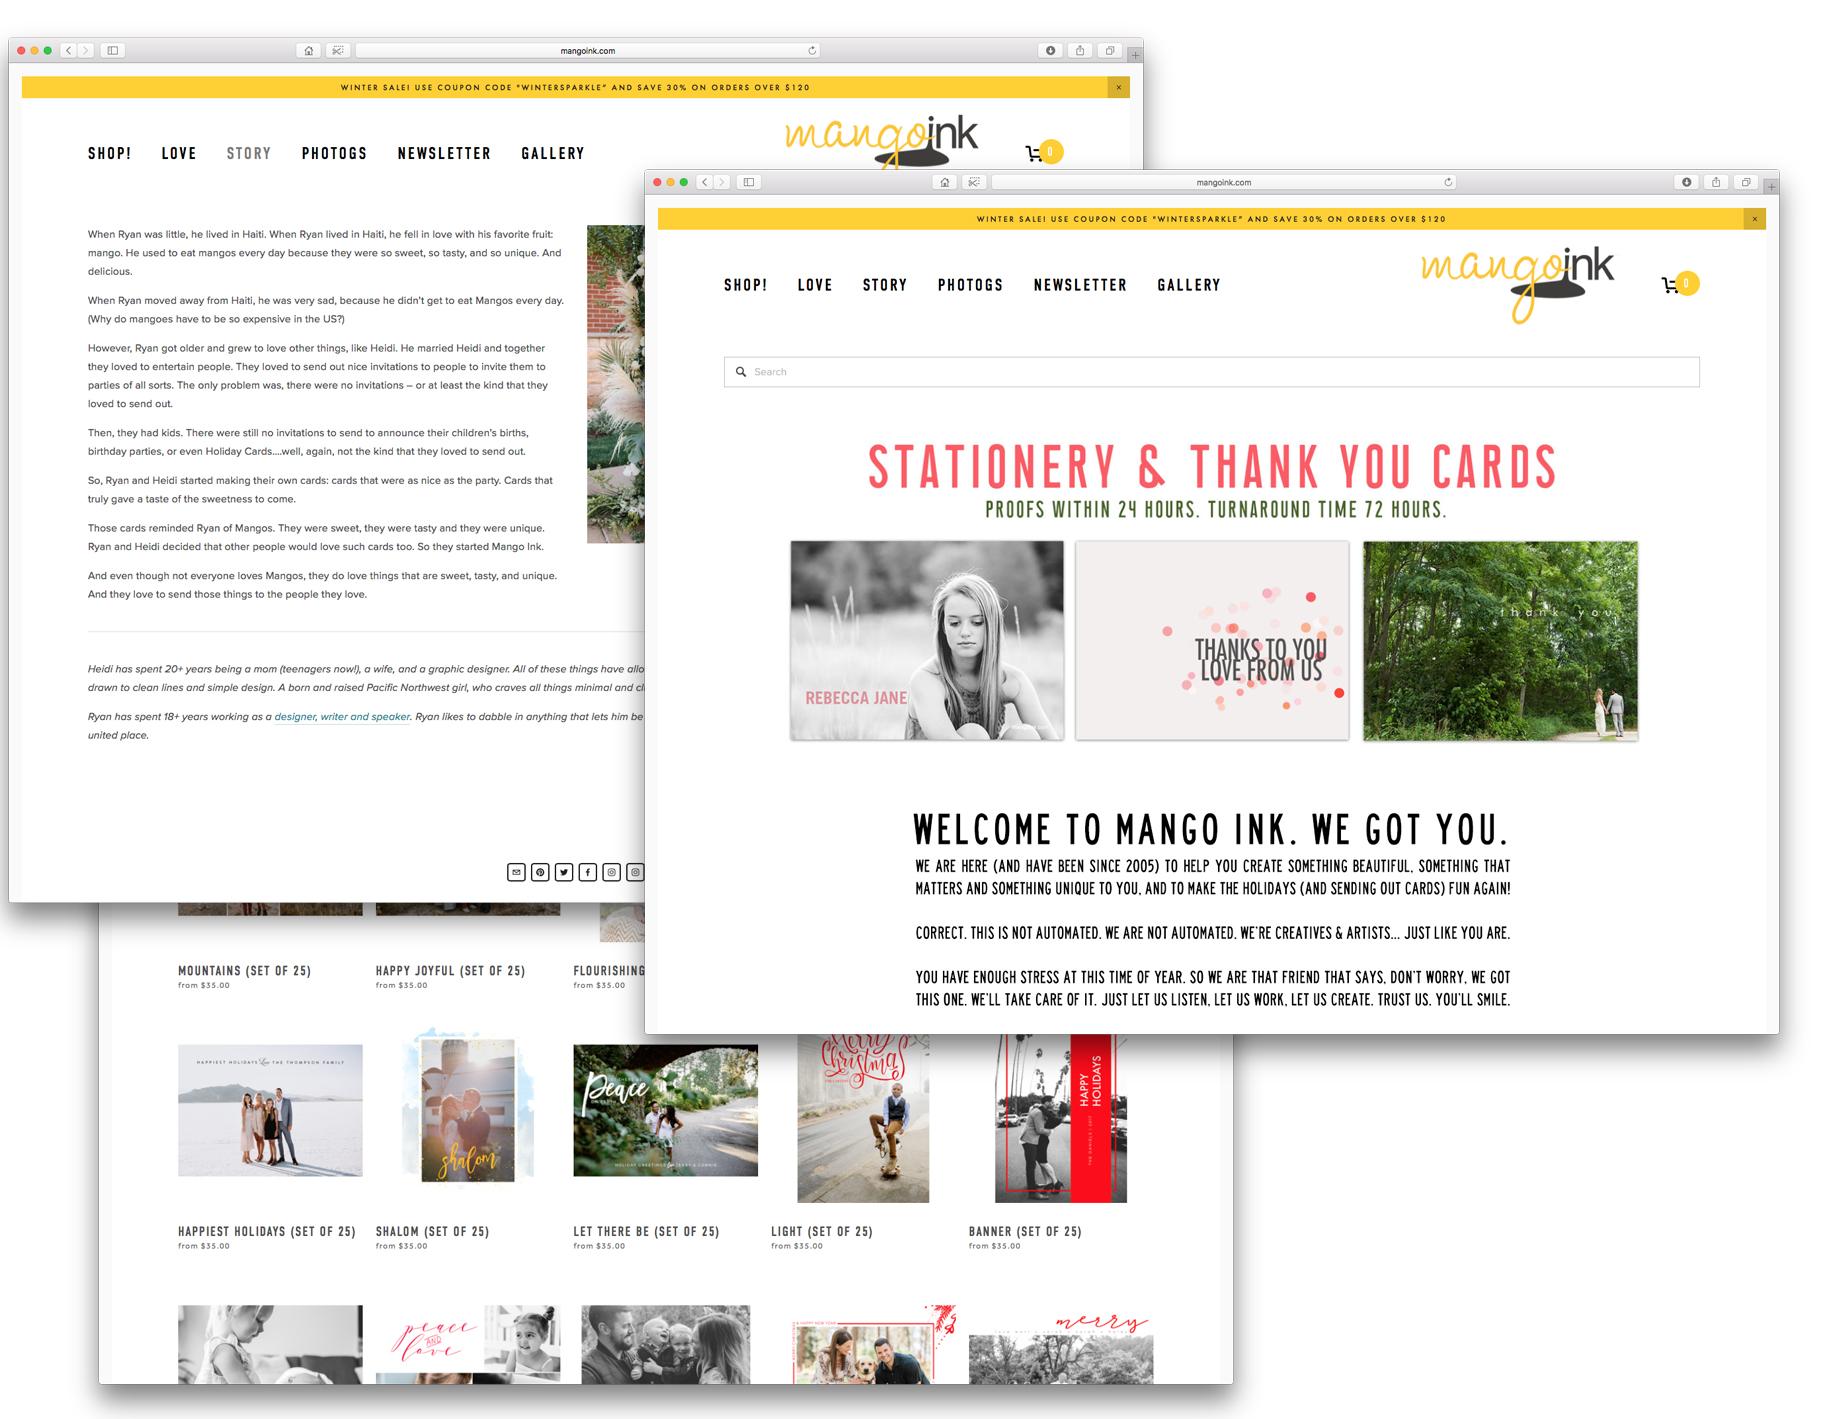 mangoink+copy.jpg